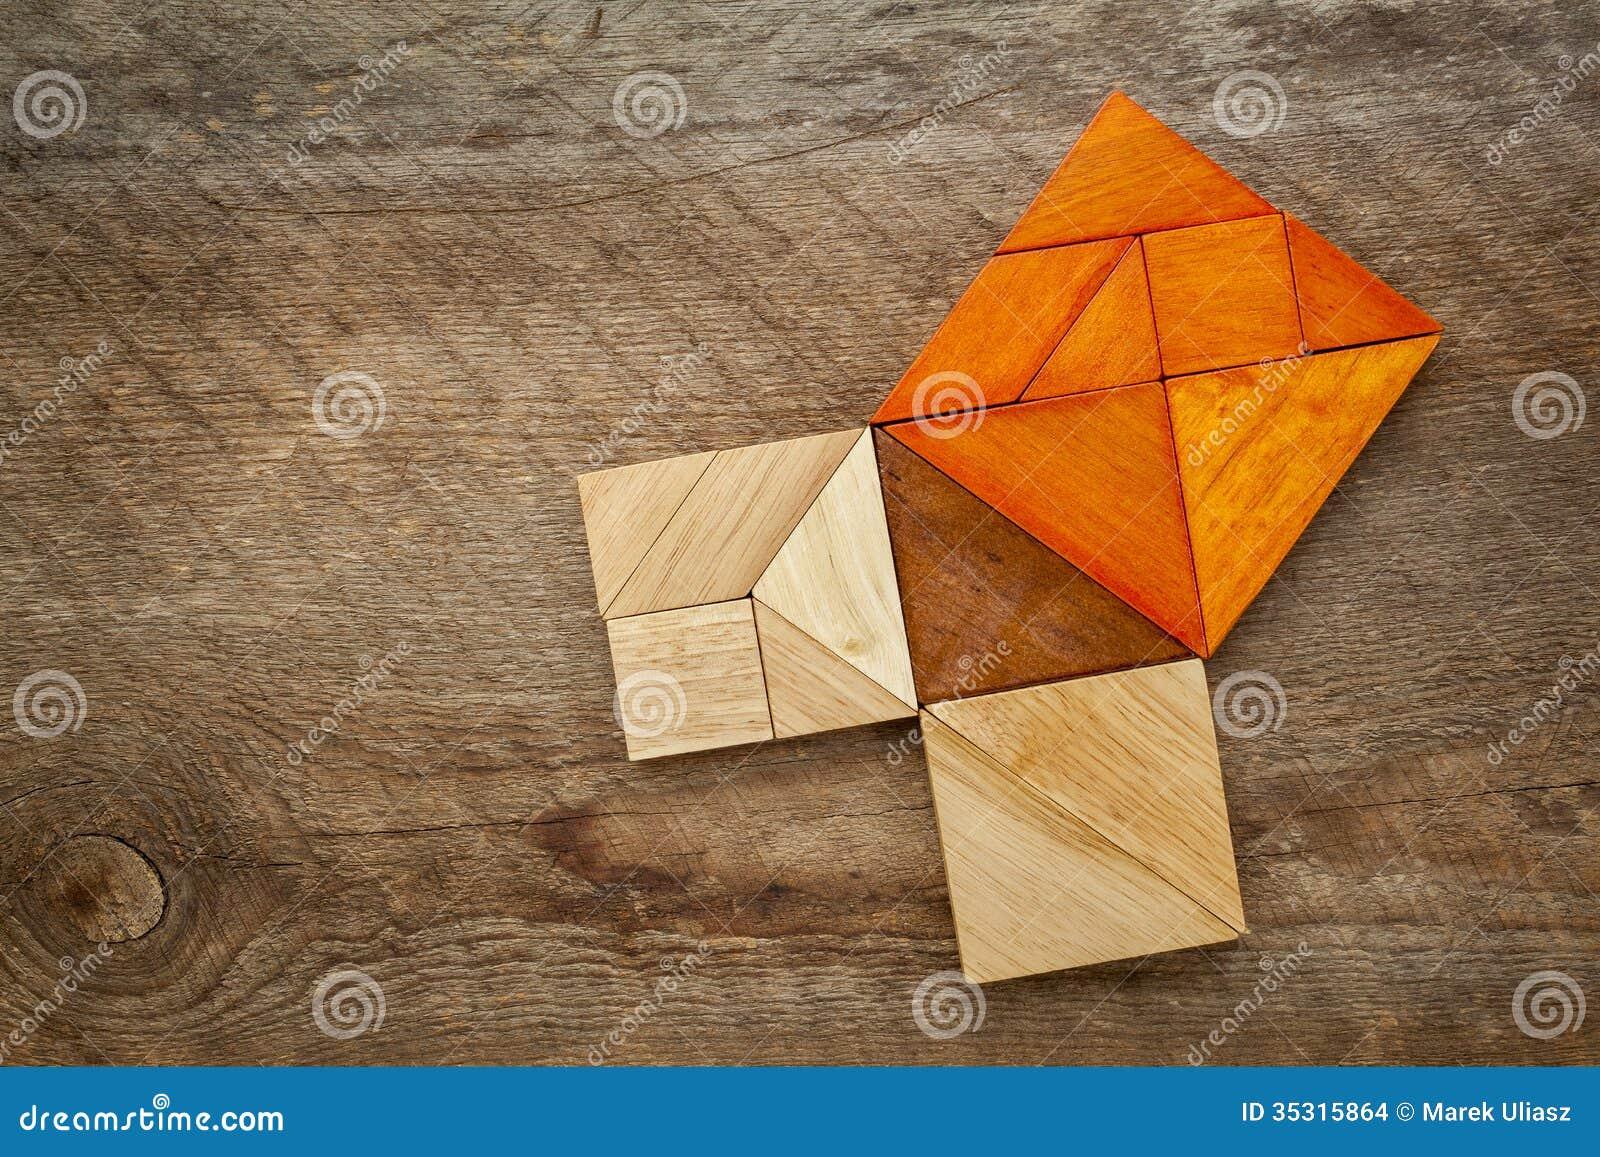 Pythagorean Theorem In Tangram Puzzle Stock Photo Image